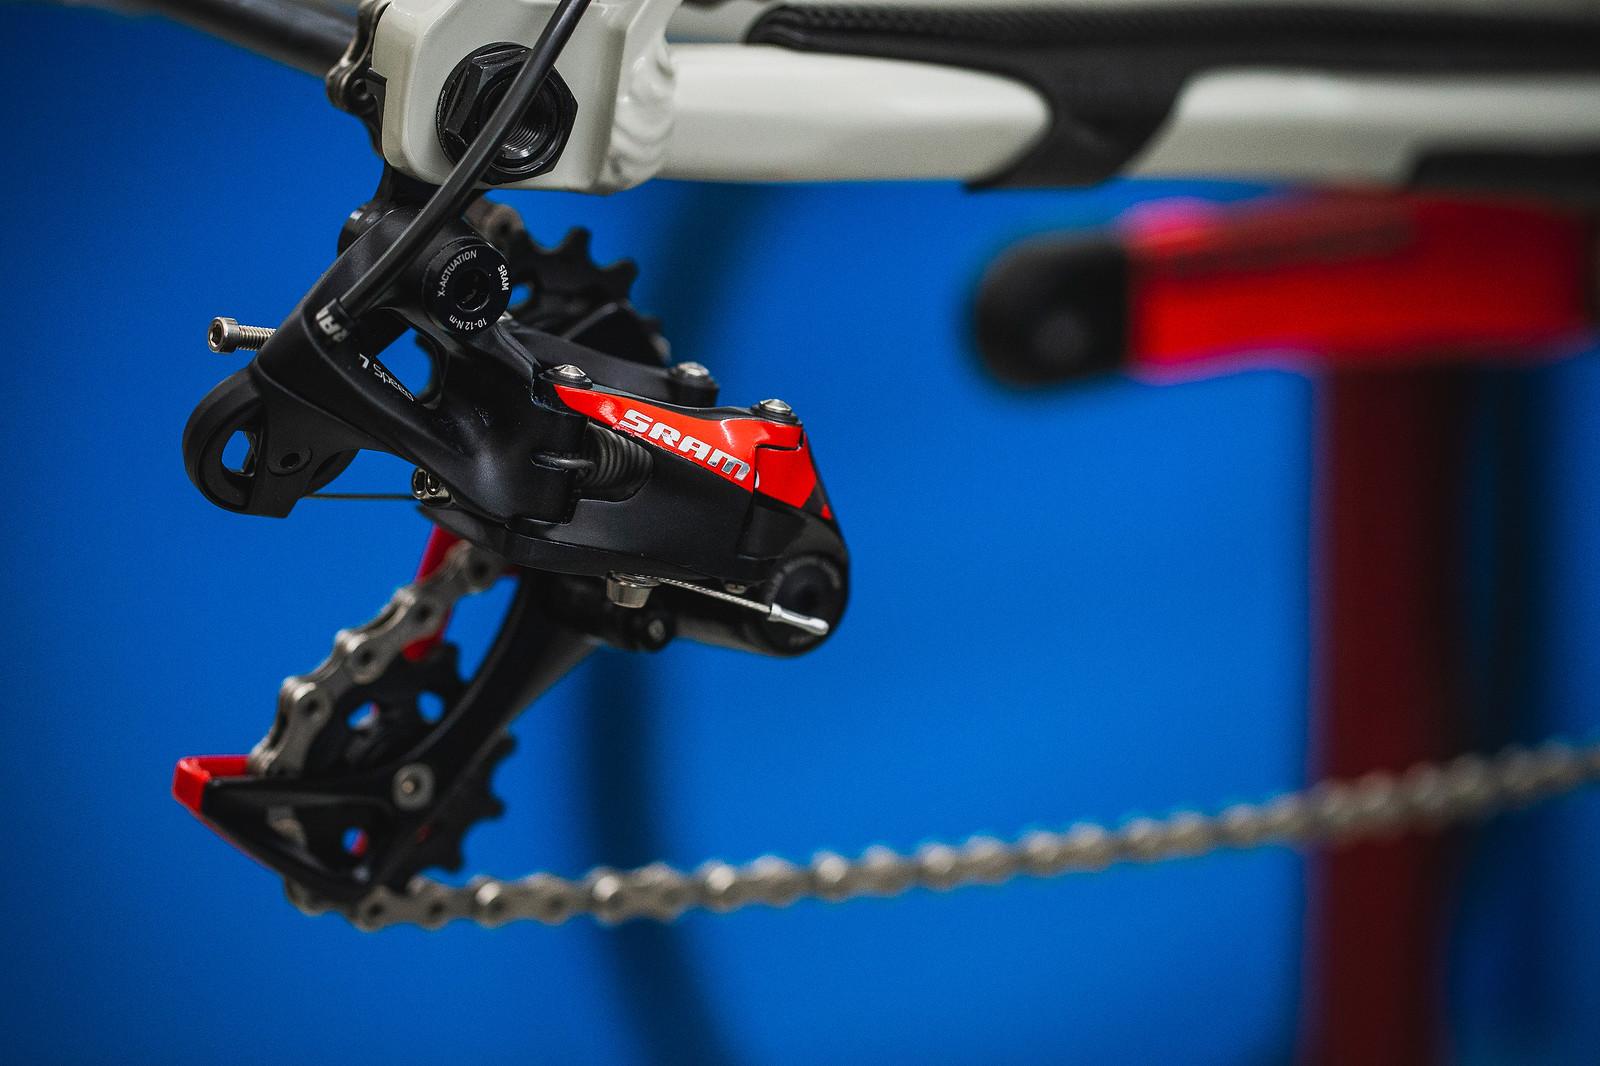 SRAM X01 DH 7-speed Rear Derailleur - PIT BITS - 2019 Val di Sole World Cup Downhill Bike Tech - Mountain Biking Pictures - Vital MTB